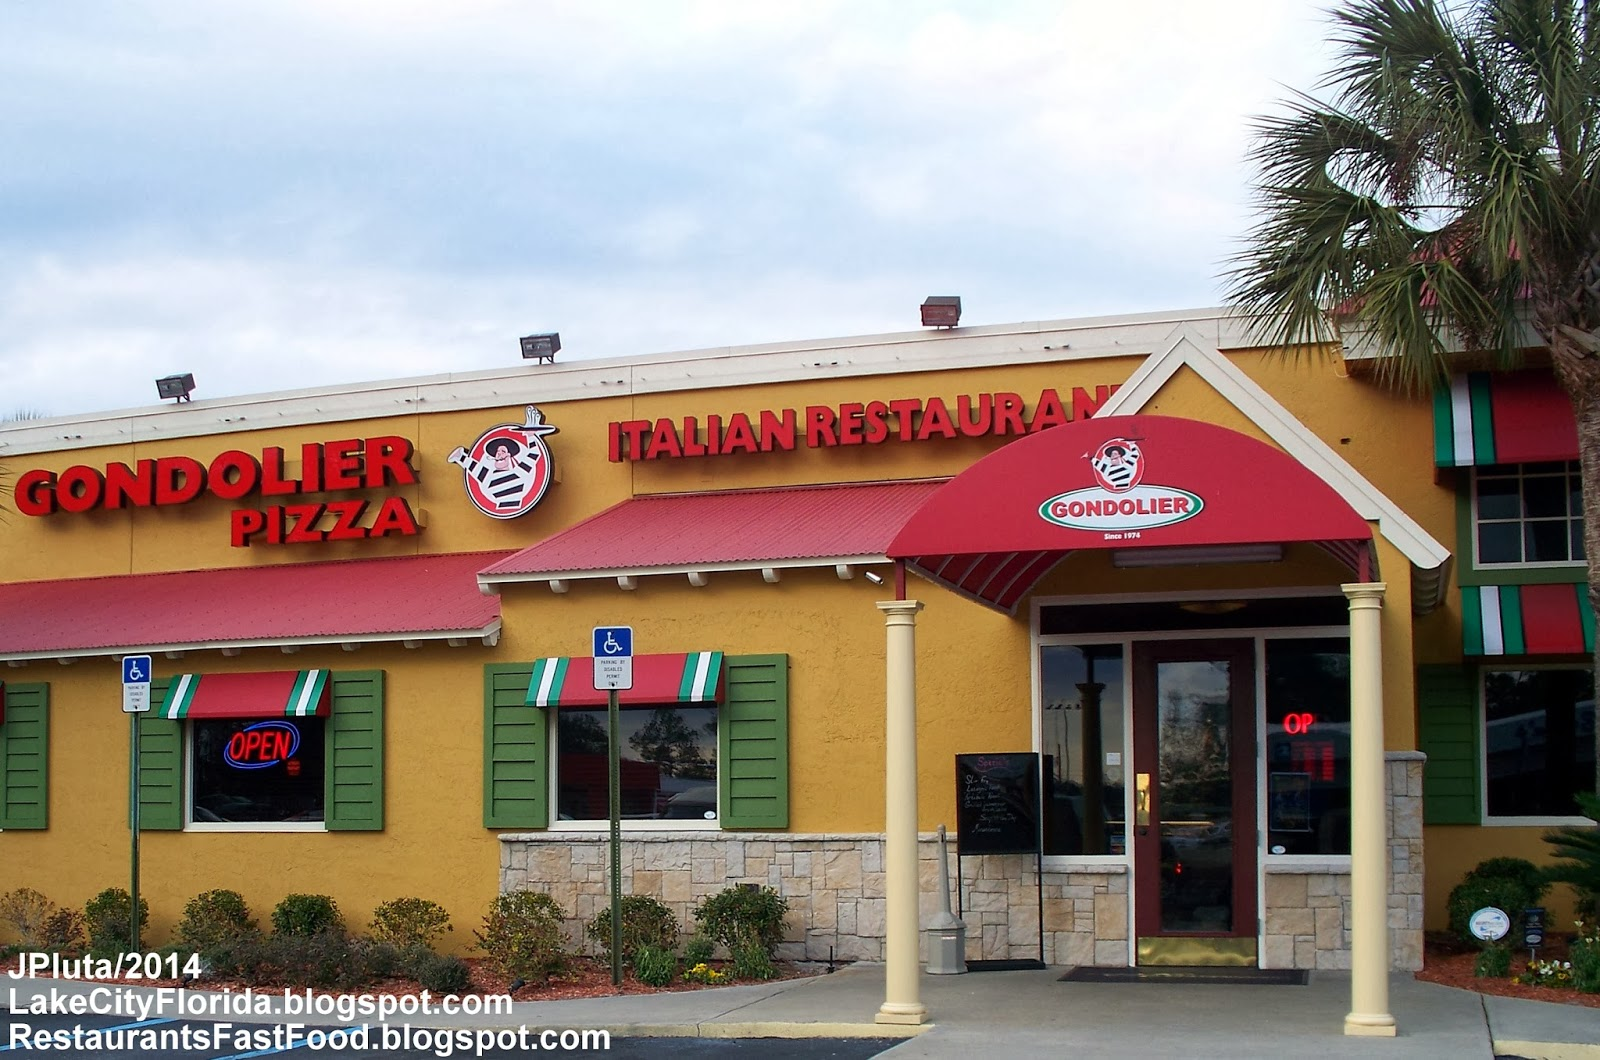 Pizza lake city florida w us highway 90 gondolier italian restaurant